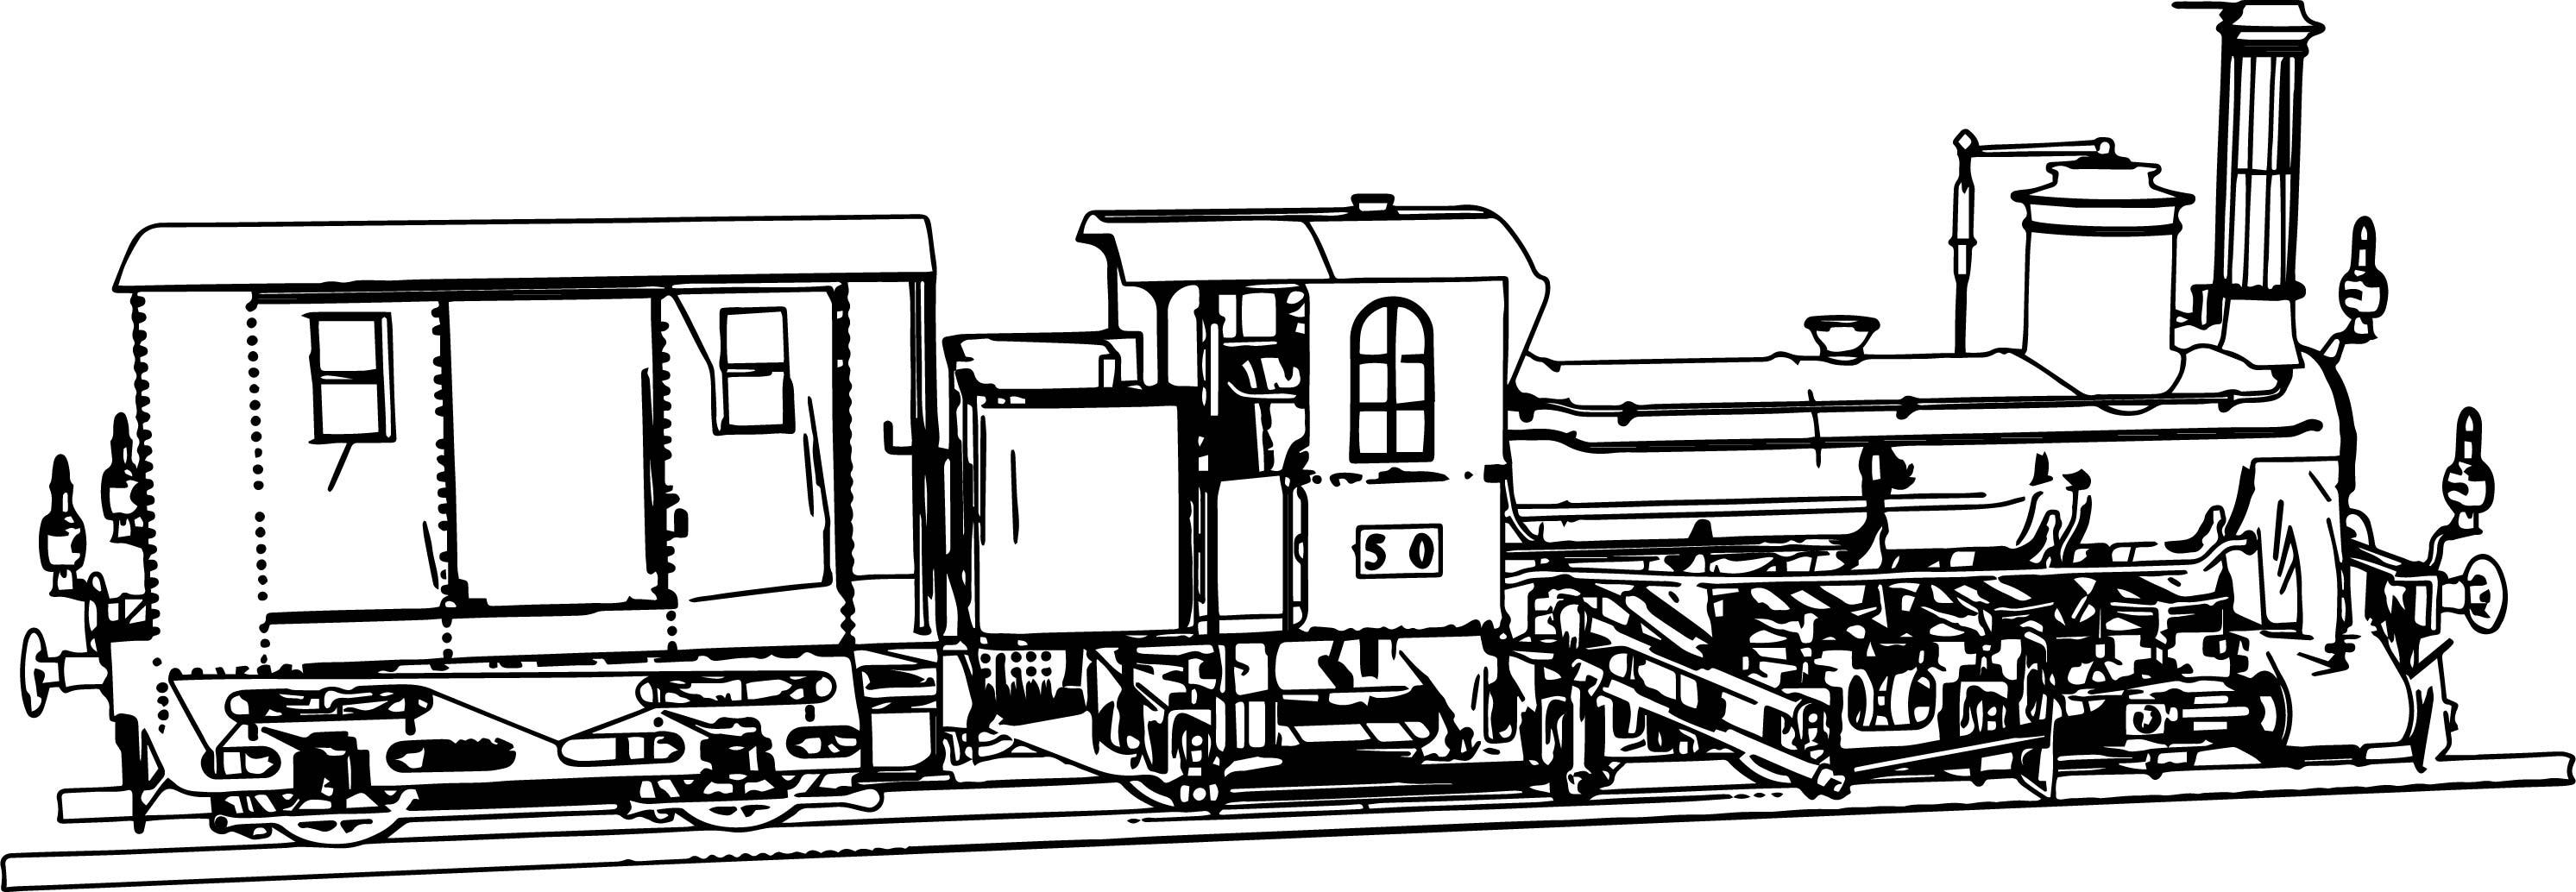 Steyerdorf Steam Locomotive Coloring Page